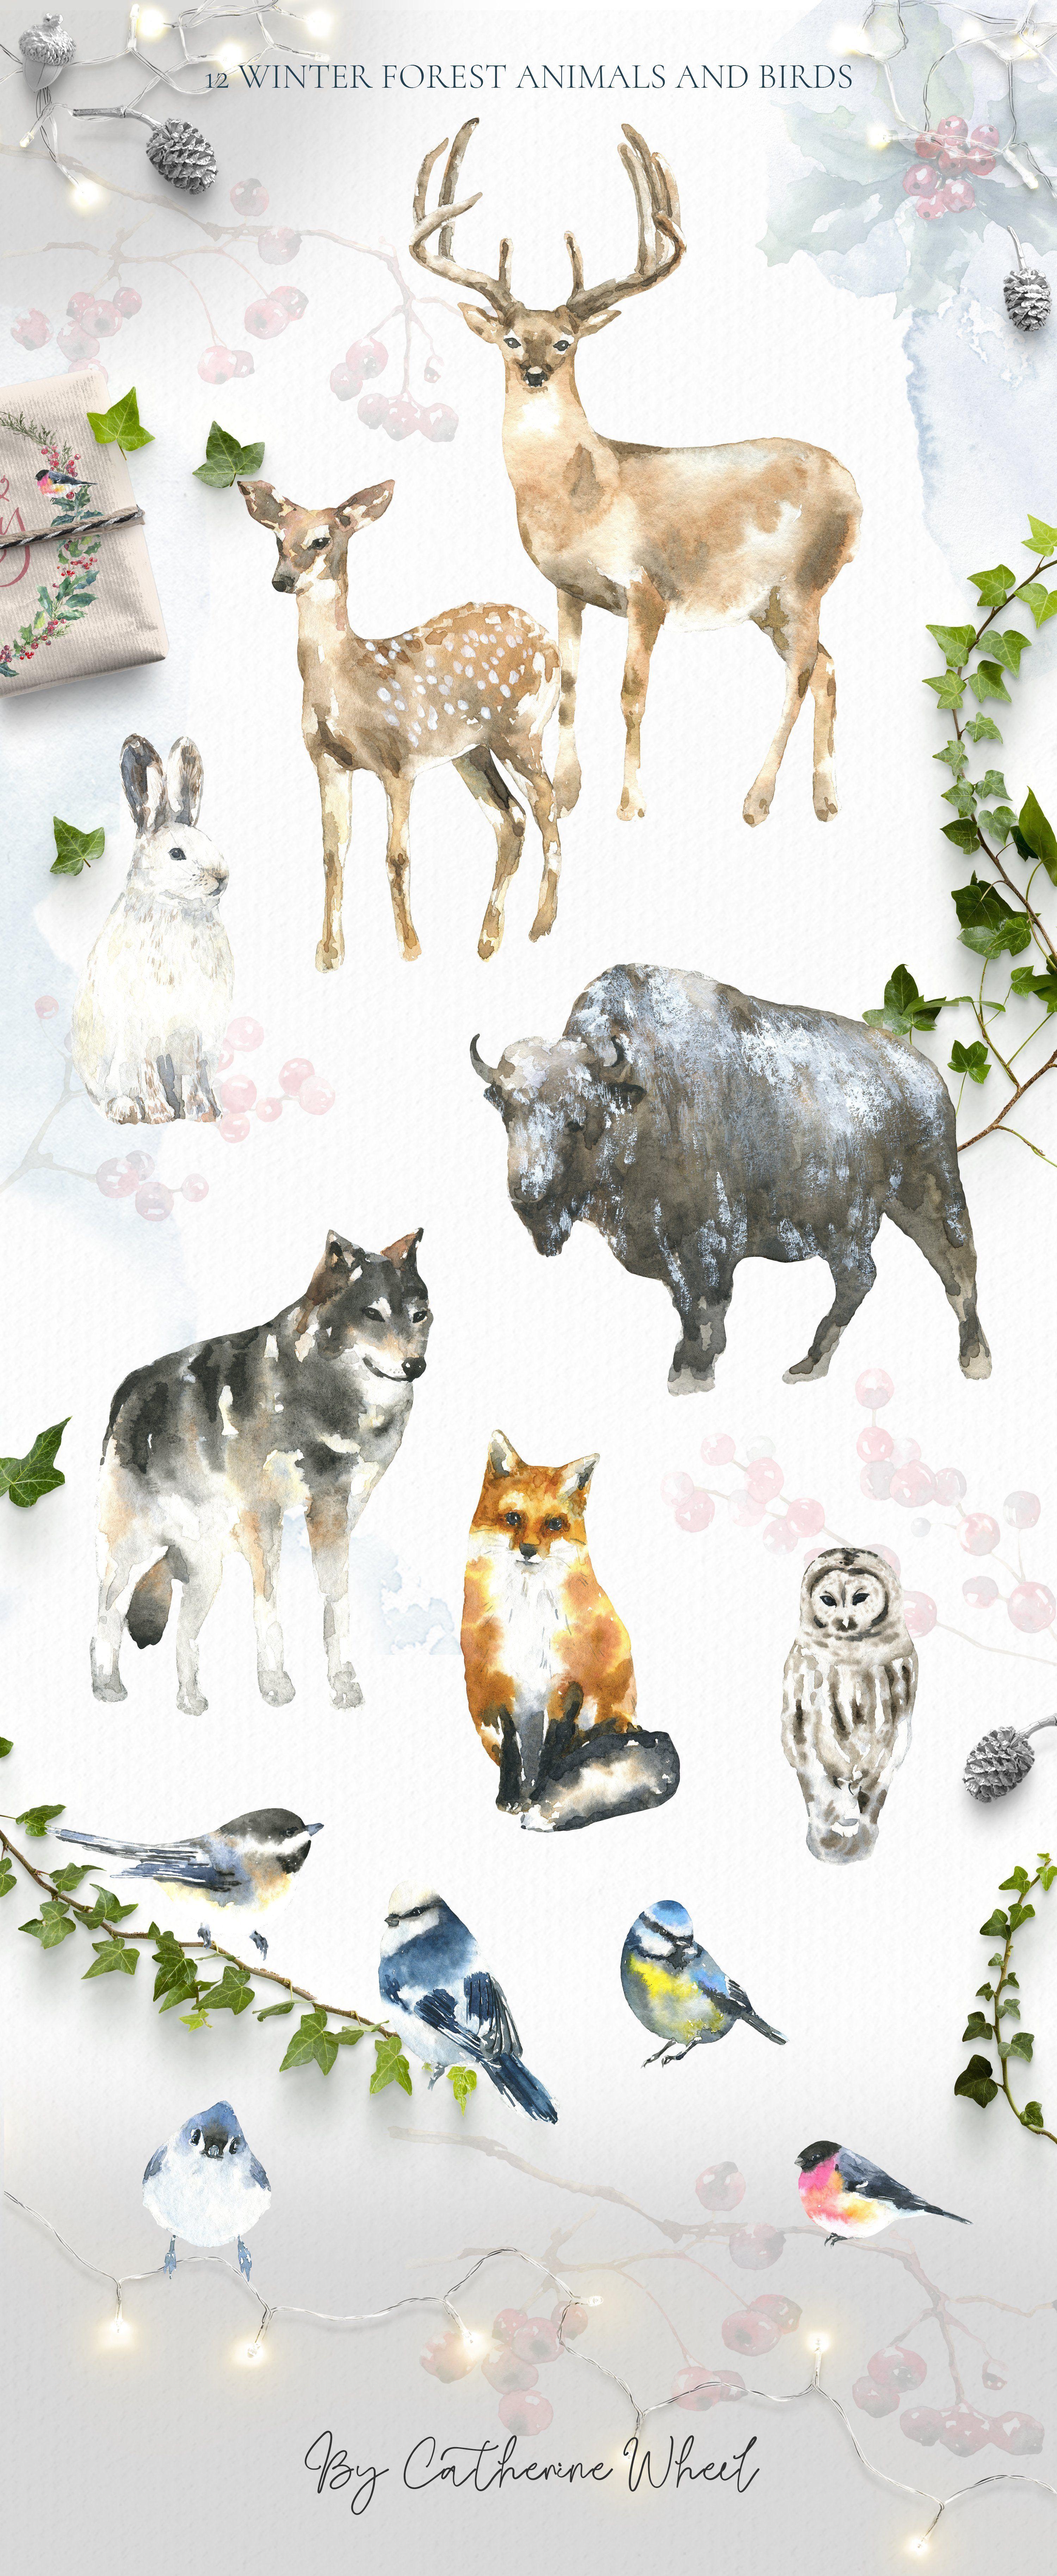 Watercolor Animals Bundle 12 in 1 by Catherine Wheel on @creativemarket #1weihnachtstaglustig